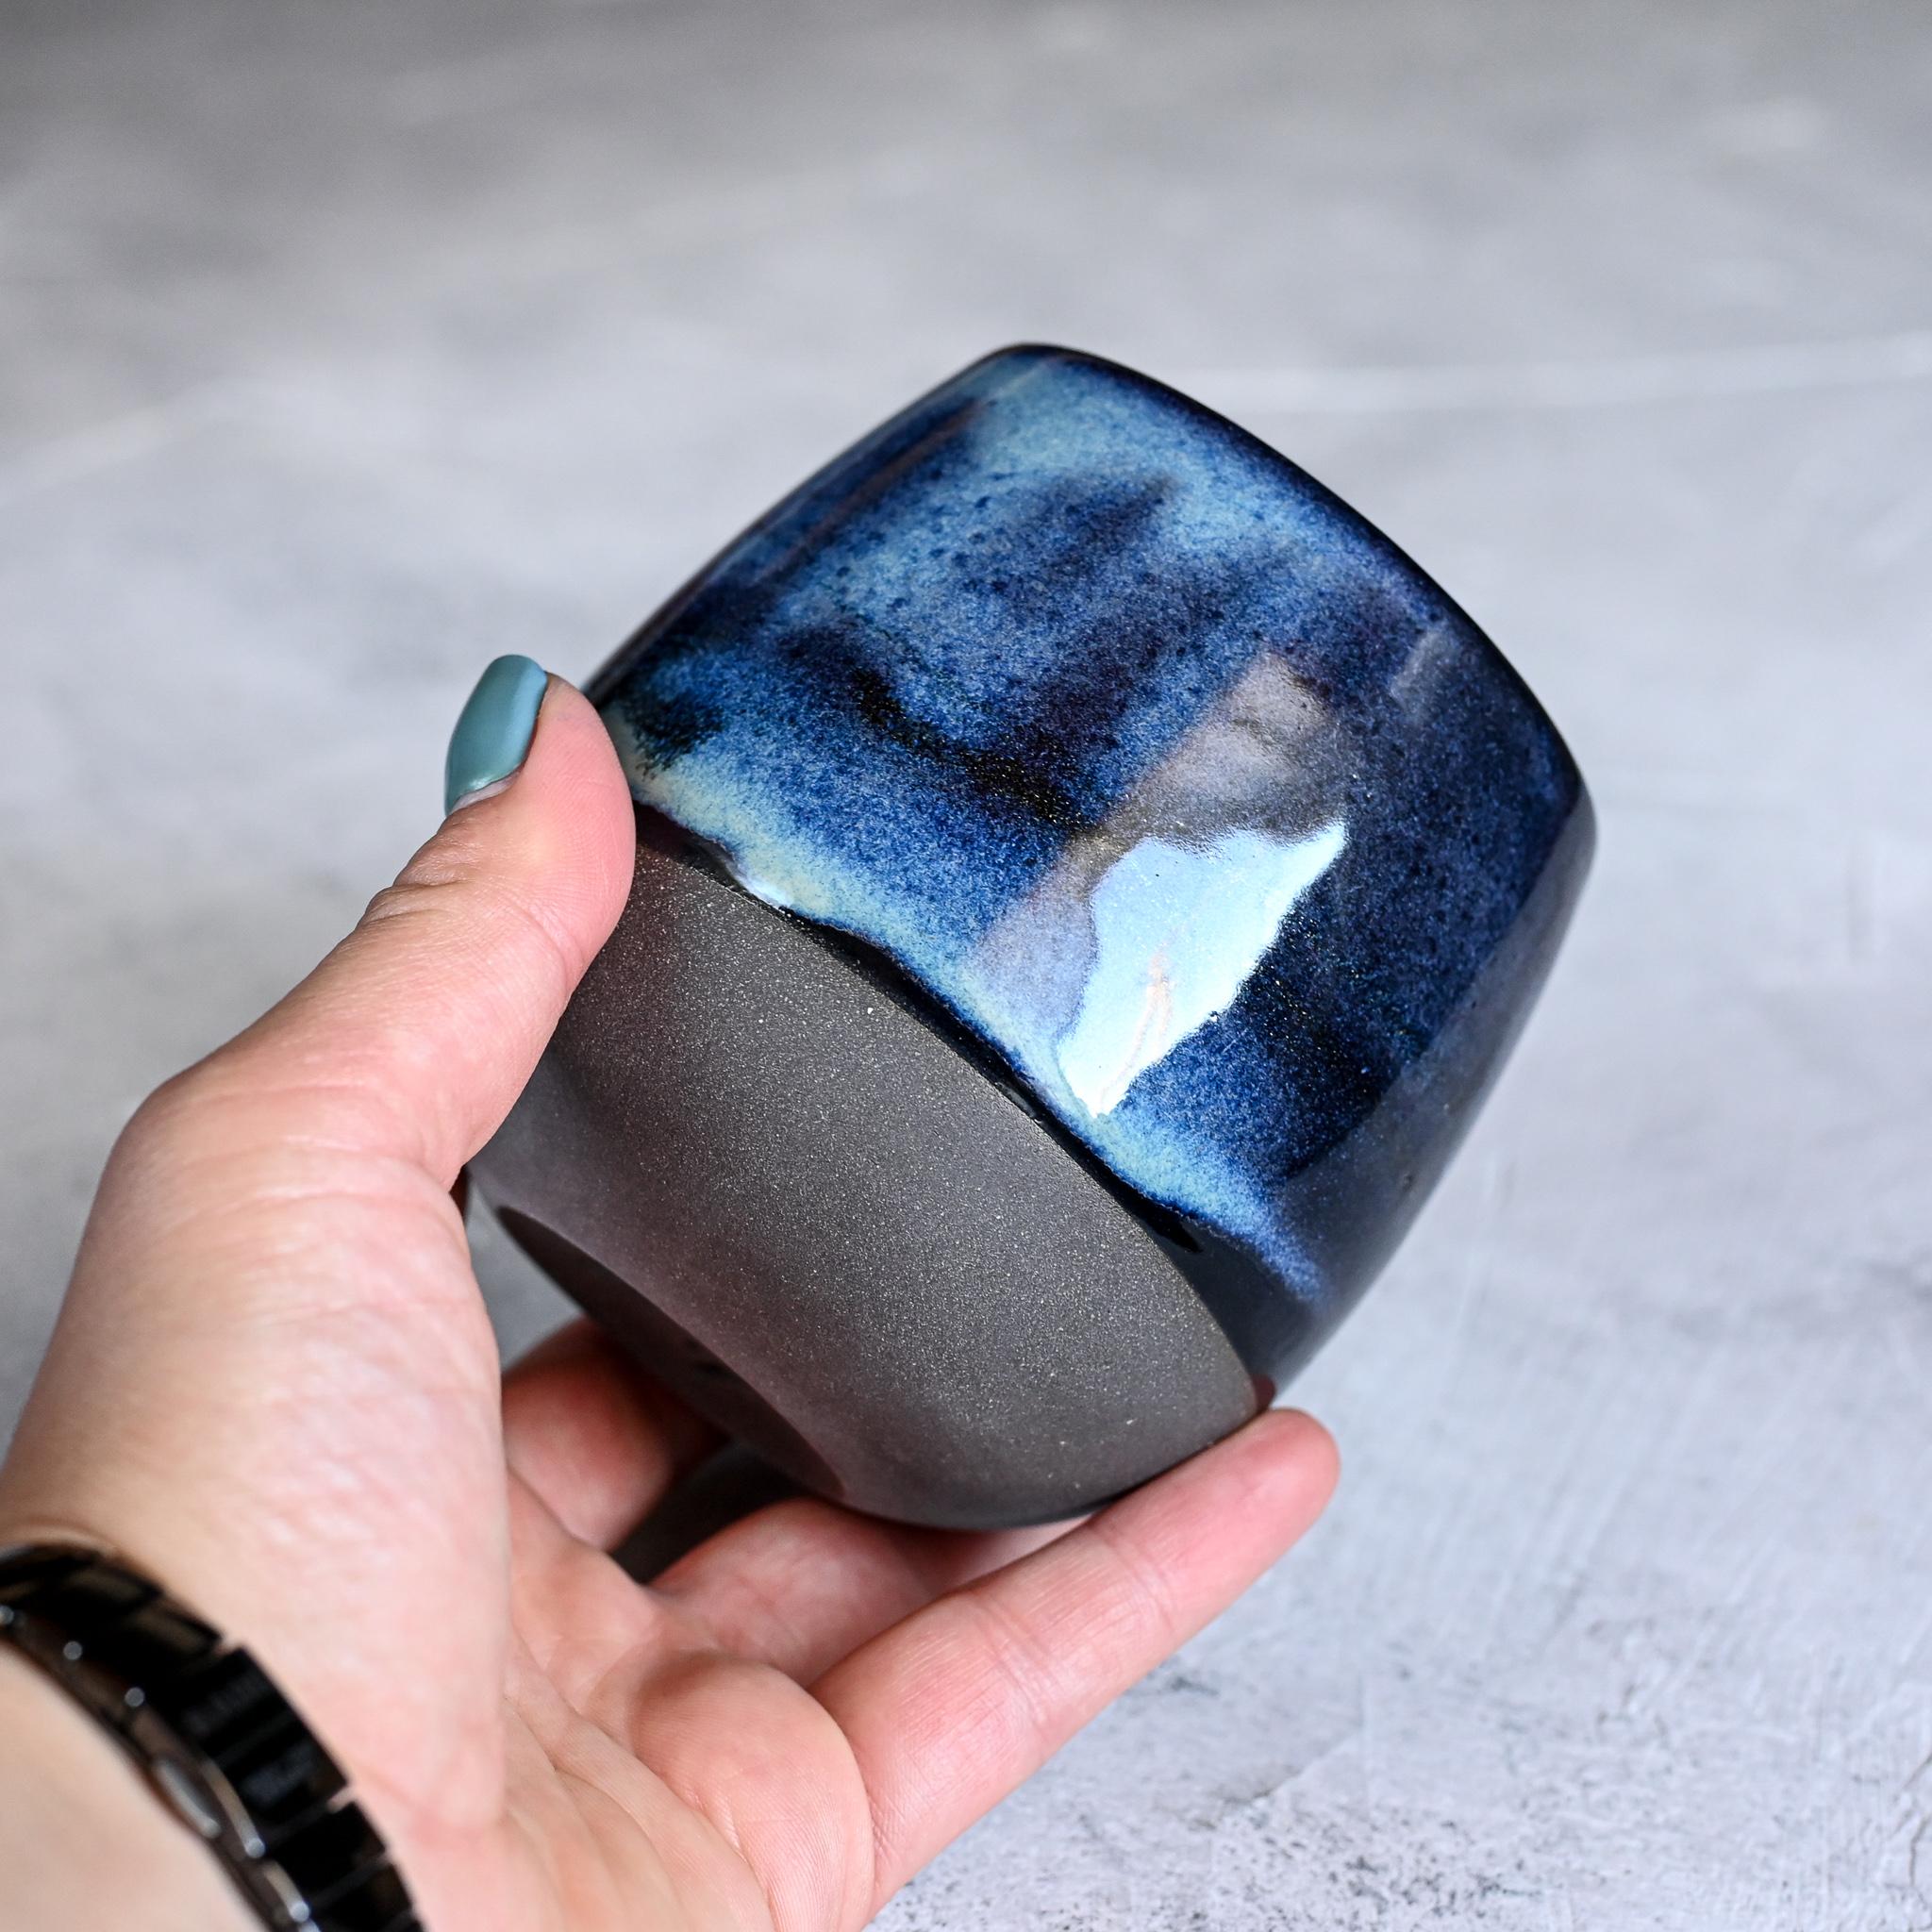 "картинка Керамический стакан Марии Левиной ""Космос"" 5 - DishWishes.Ru"